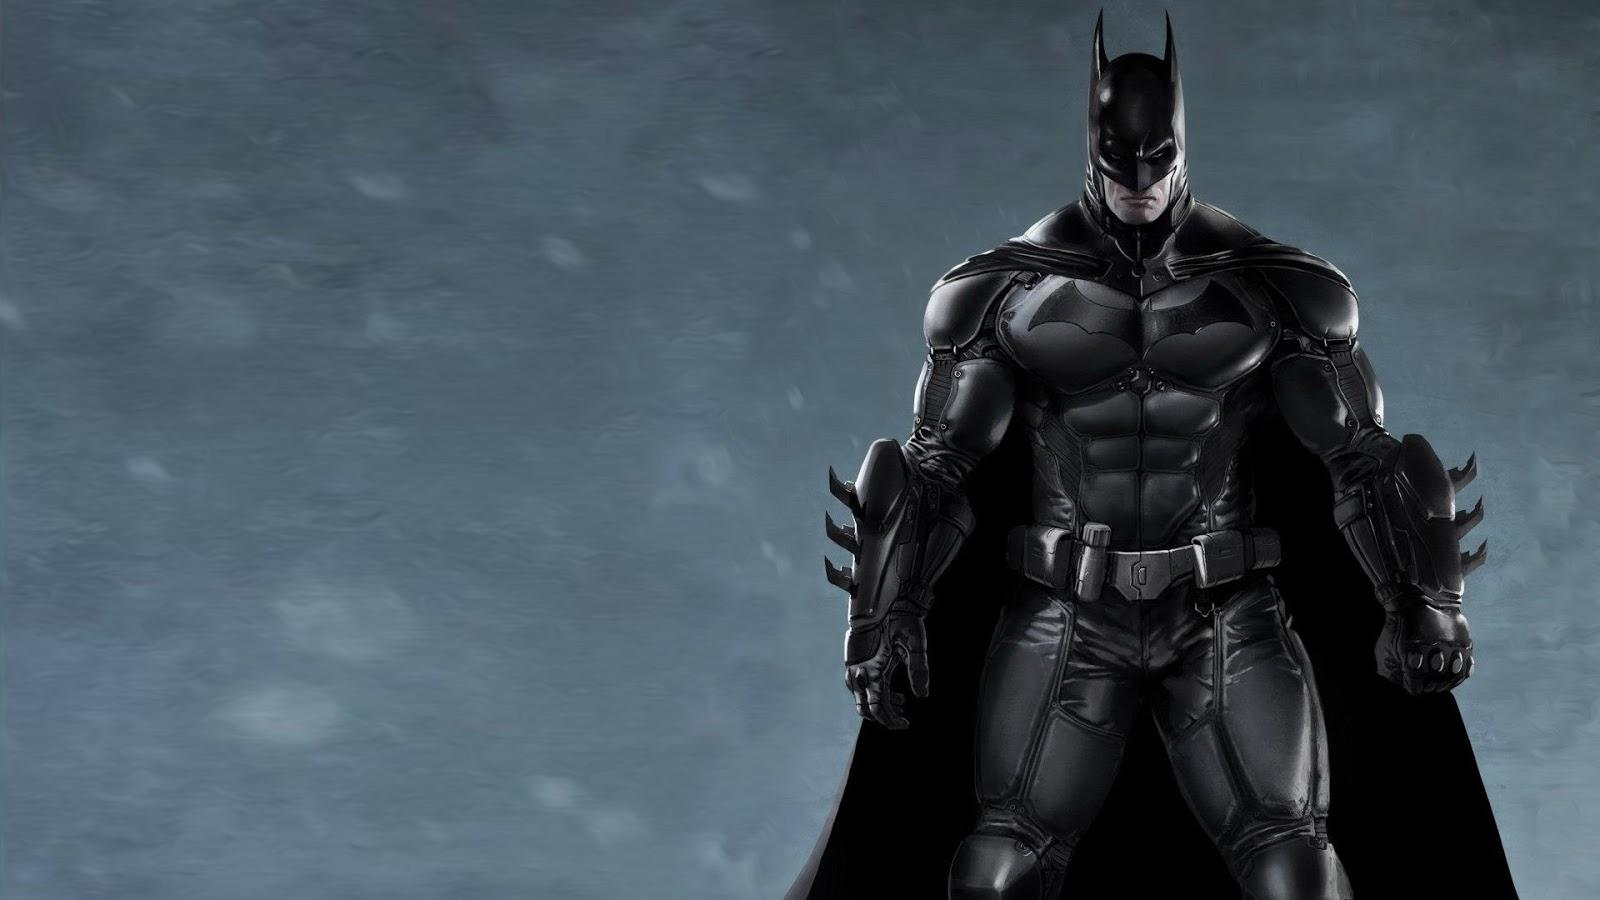 batman arkham origins 6 batman arkham origins wallpaper download 1600x900